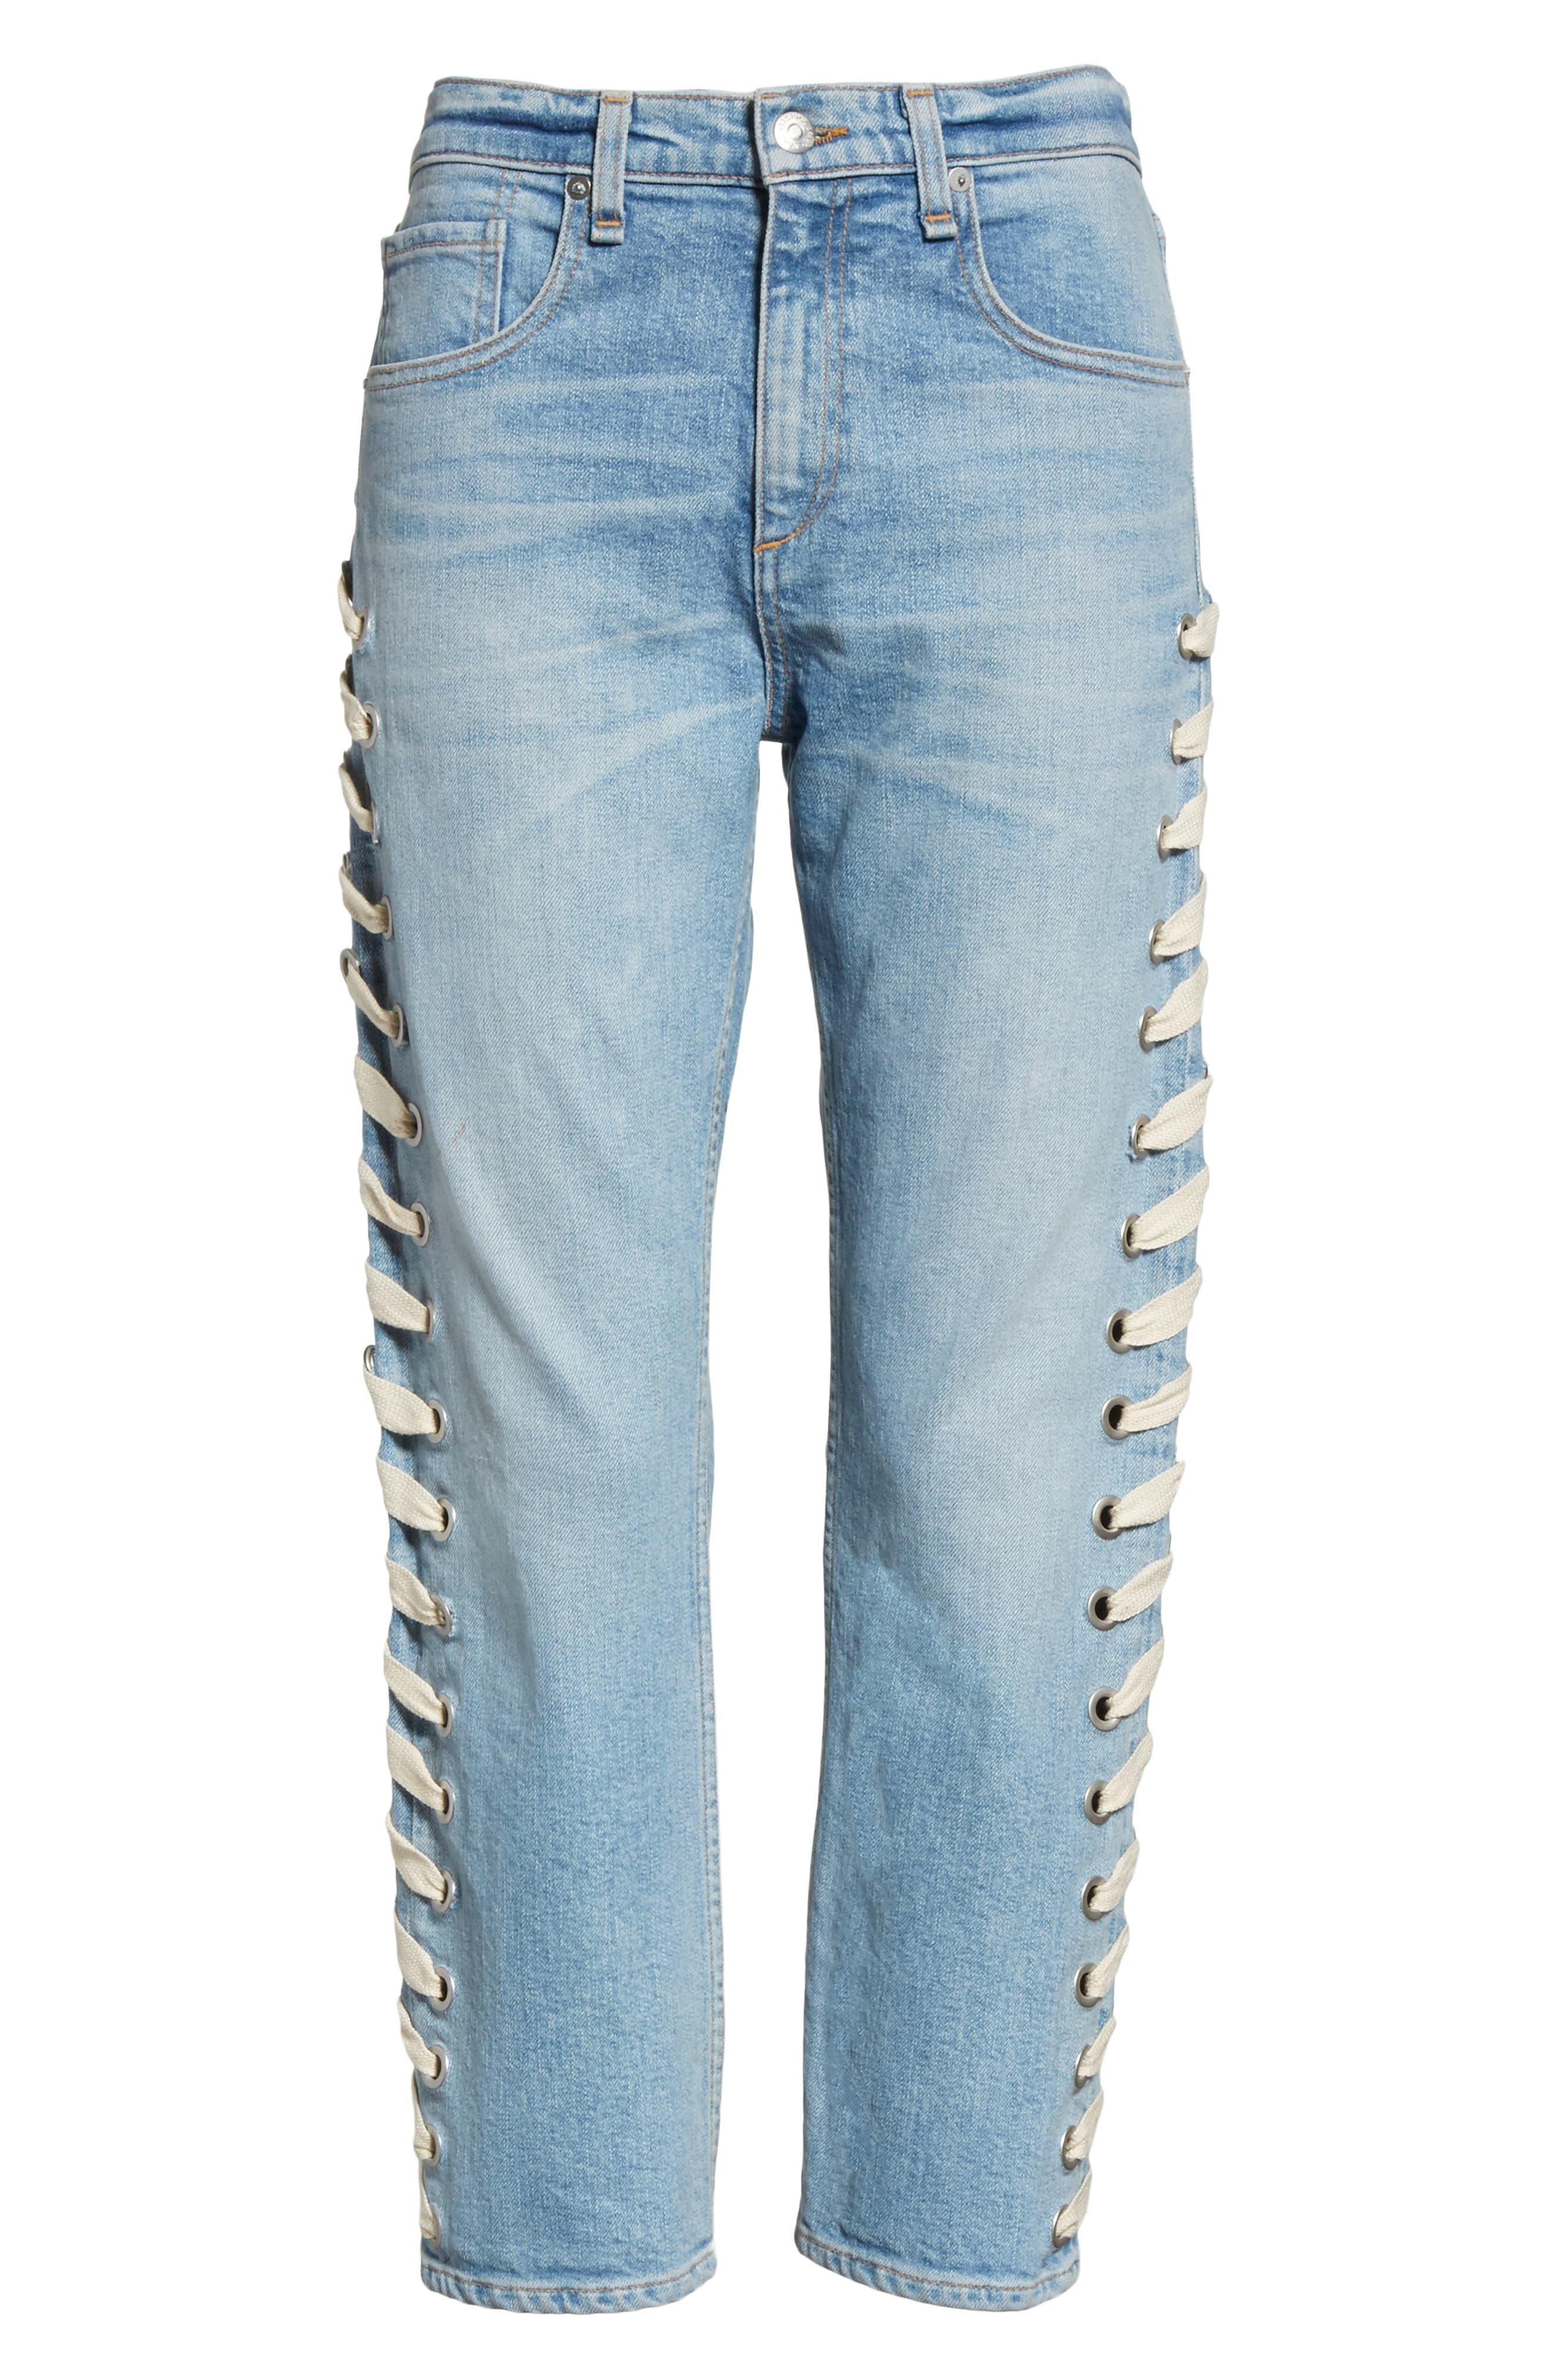 Ines Girlfriend Crop Jeans,                             Alternate thumbnail 6, color,                             452